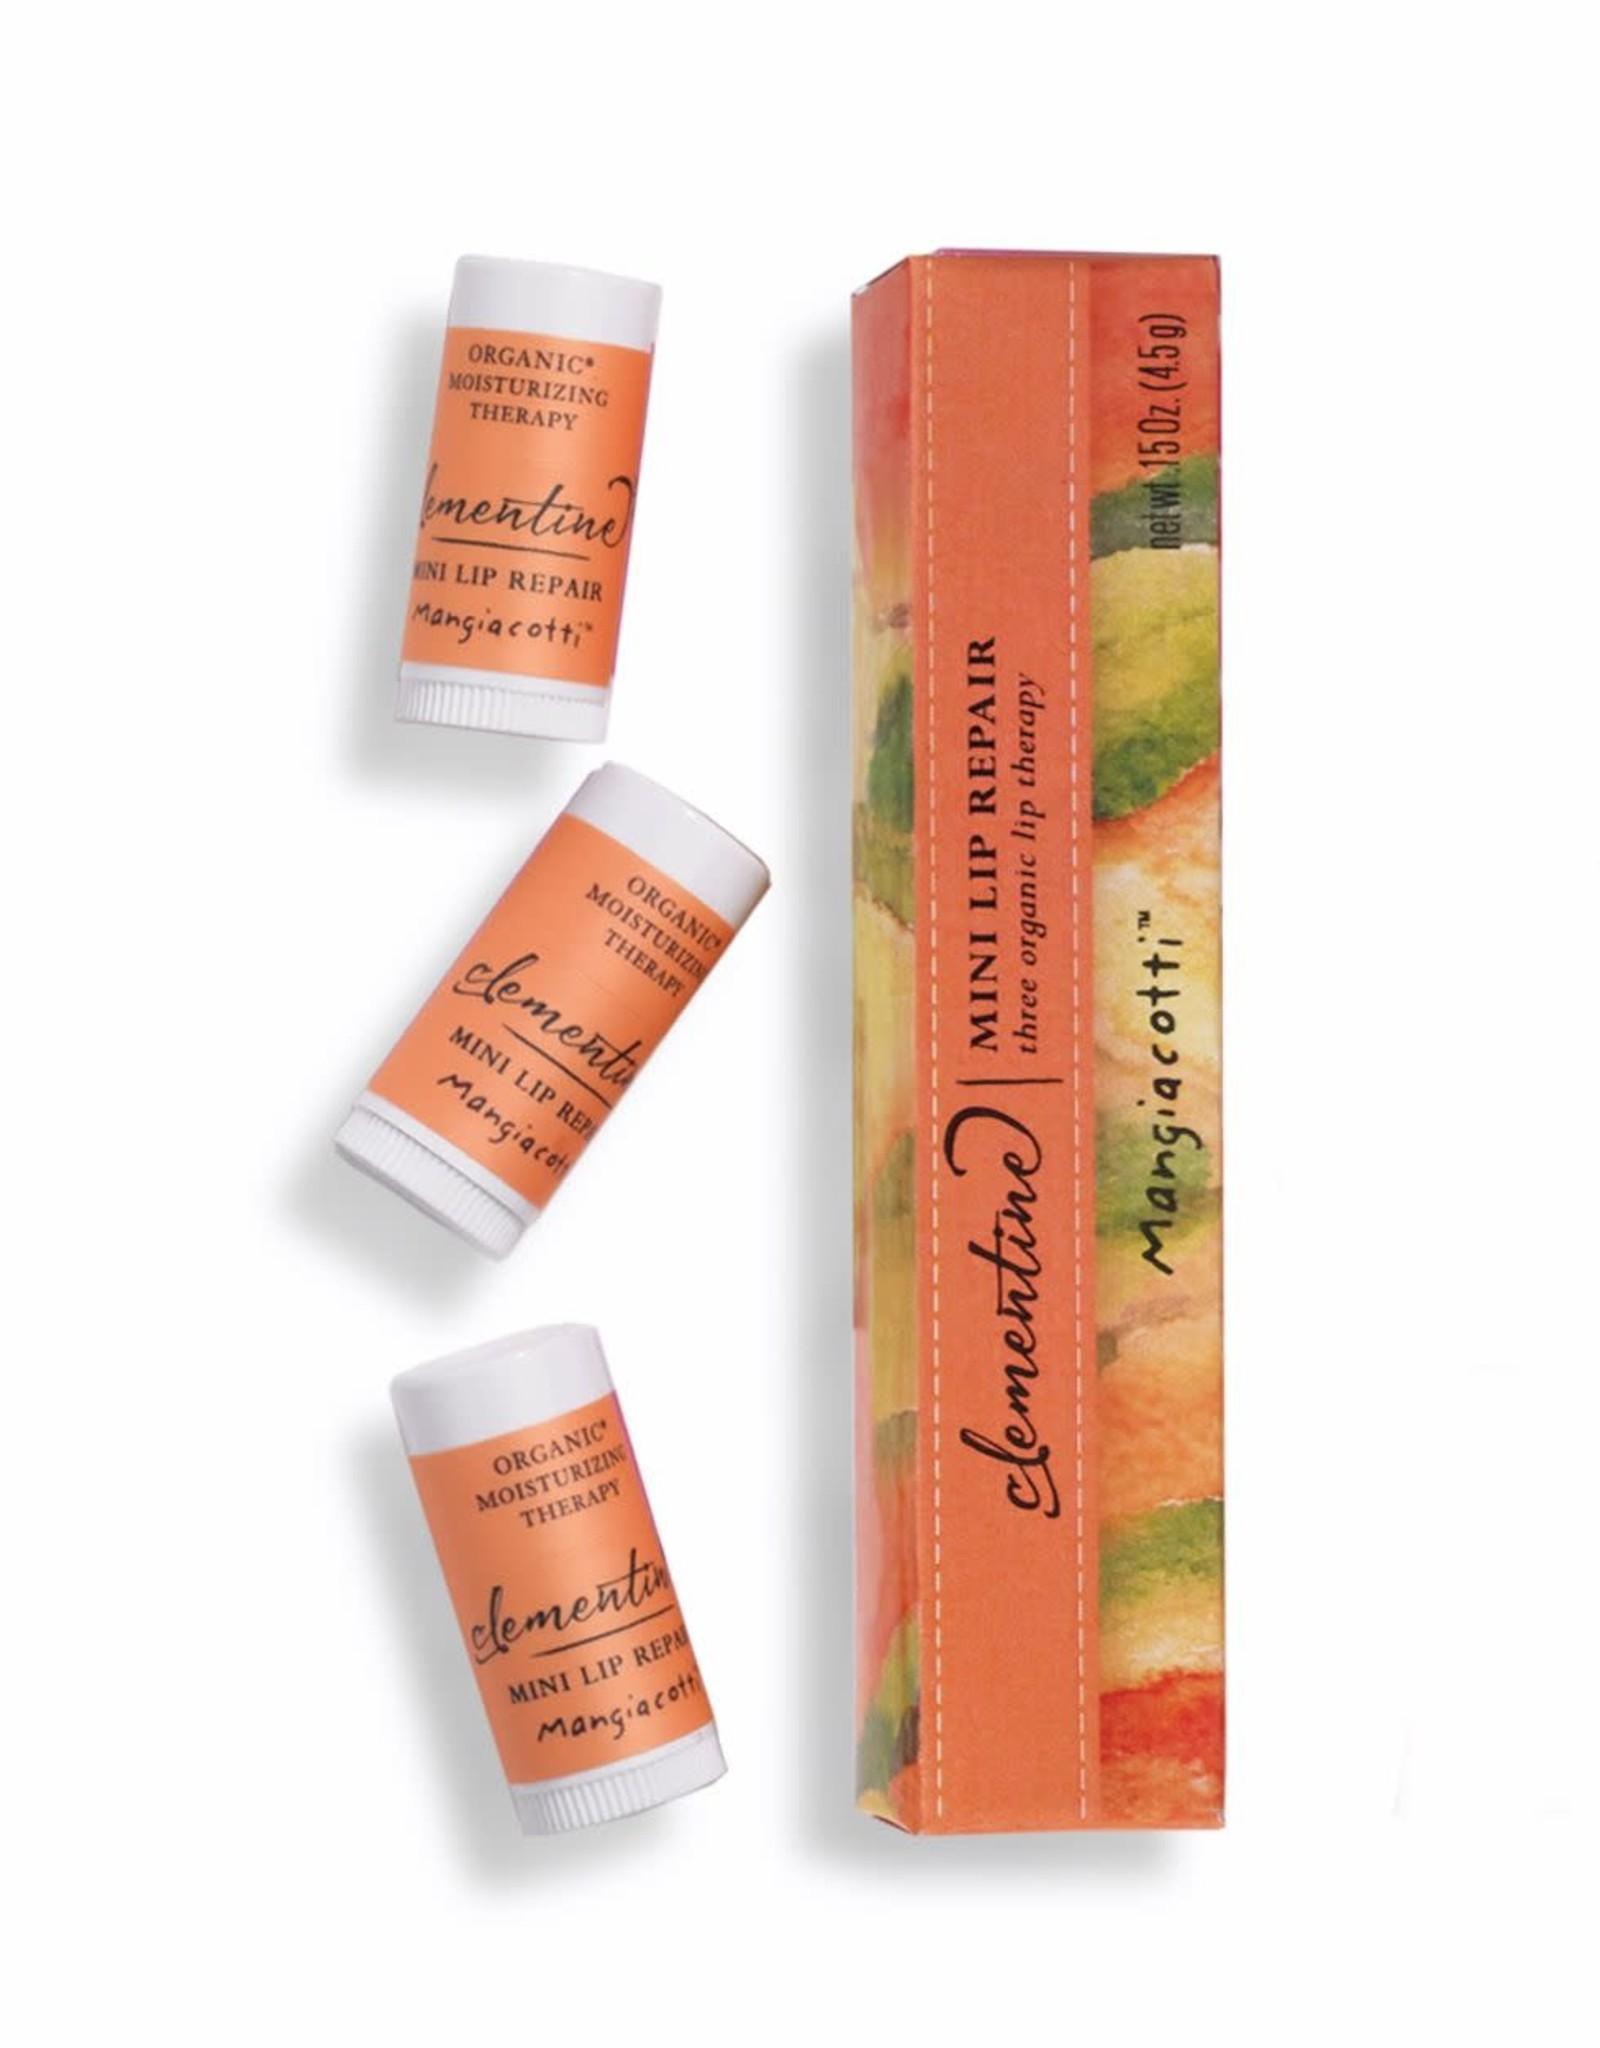 Clementine Mini Lip Repair